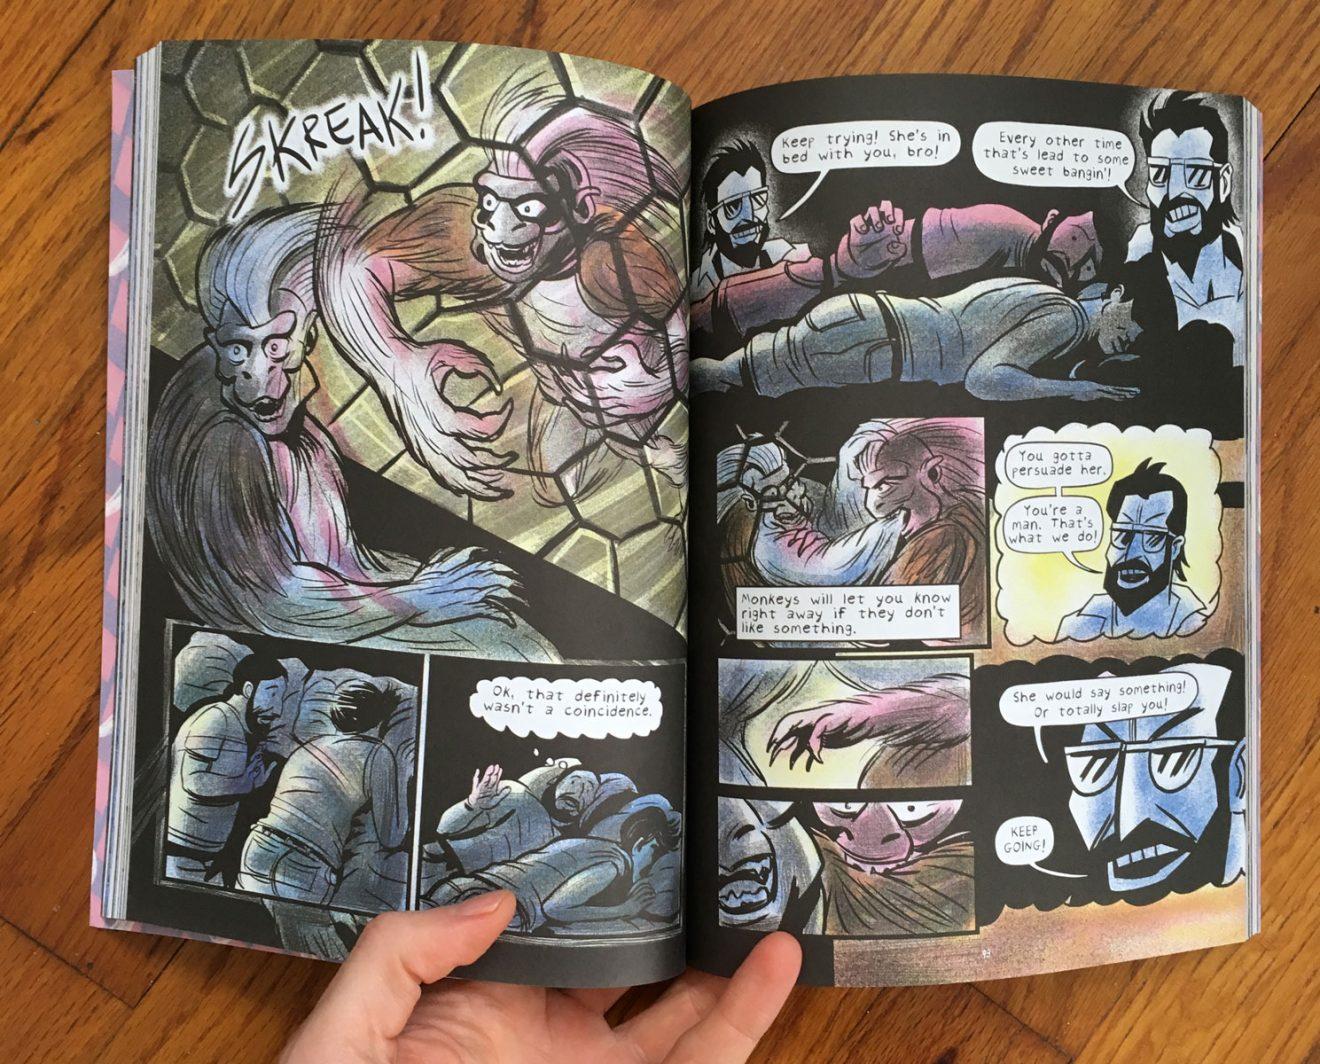 Monkey Chef A Love Story by Mike Freiheit